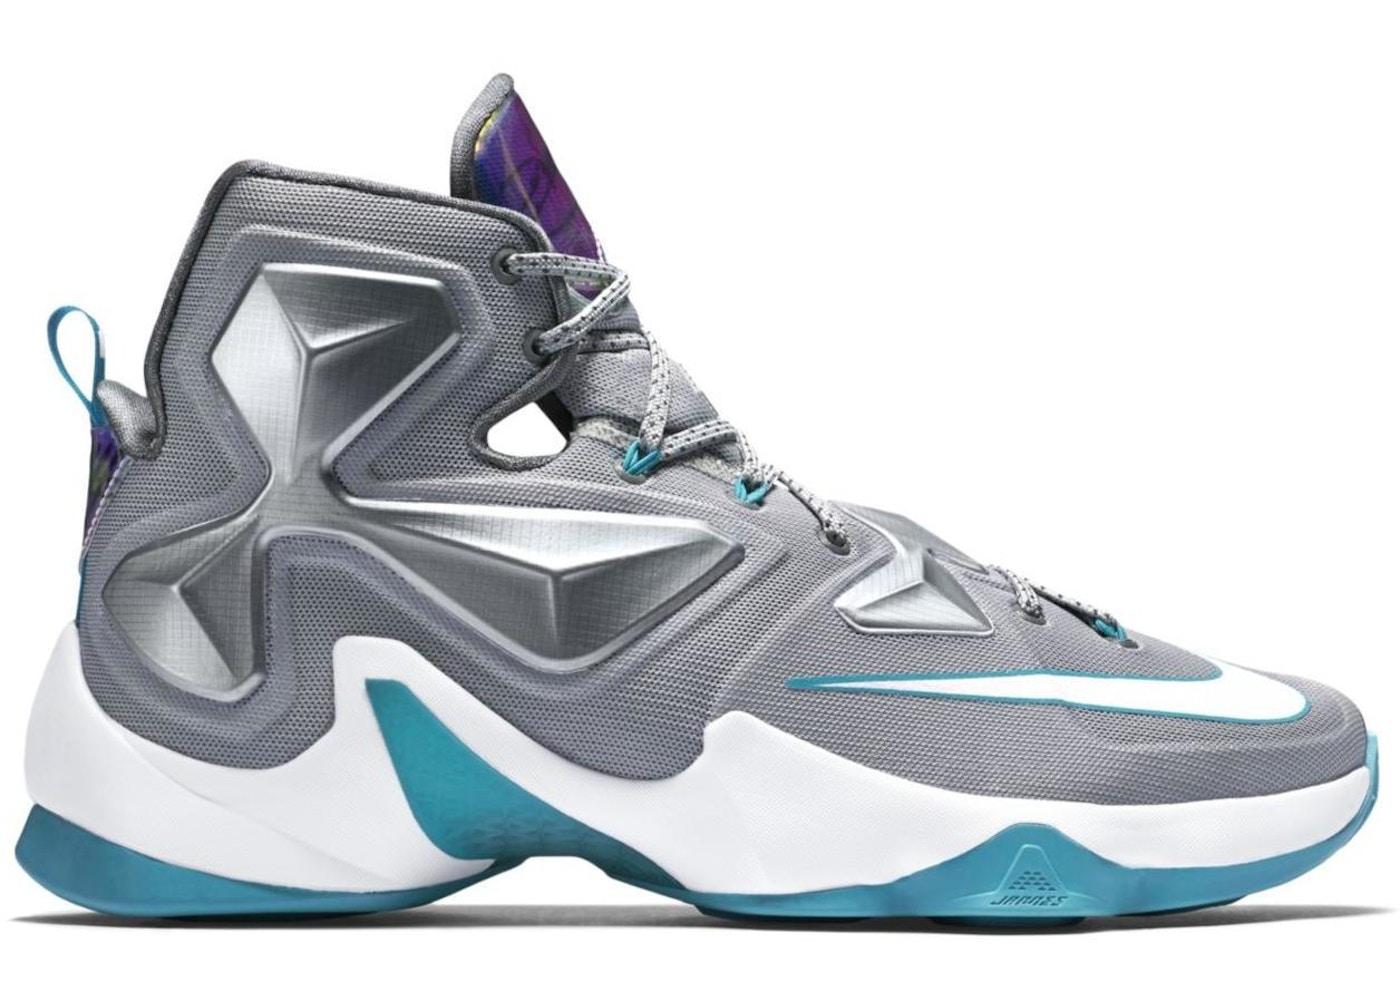 the best attitude 8fb4a e1ce9 Nike LeBron 13 Shoes - Average Sale Price